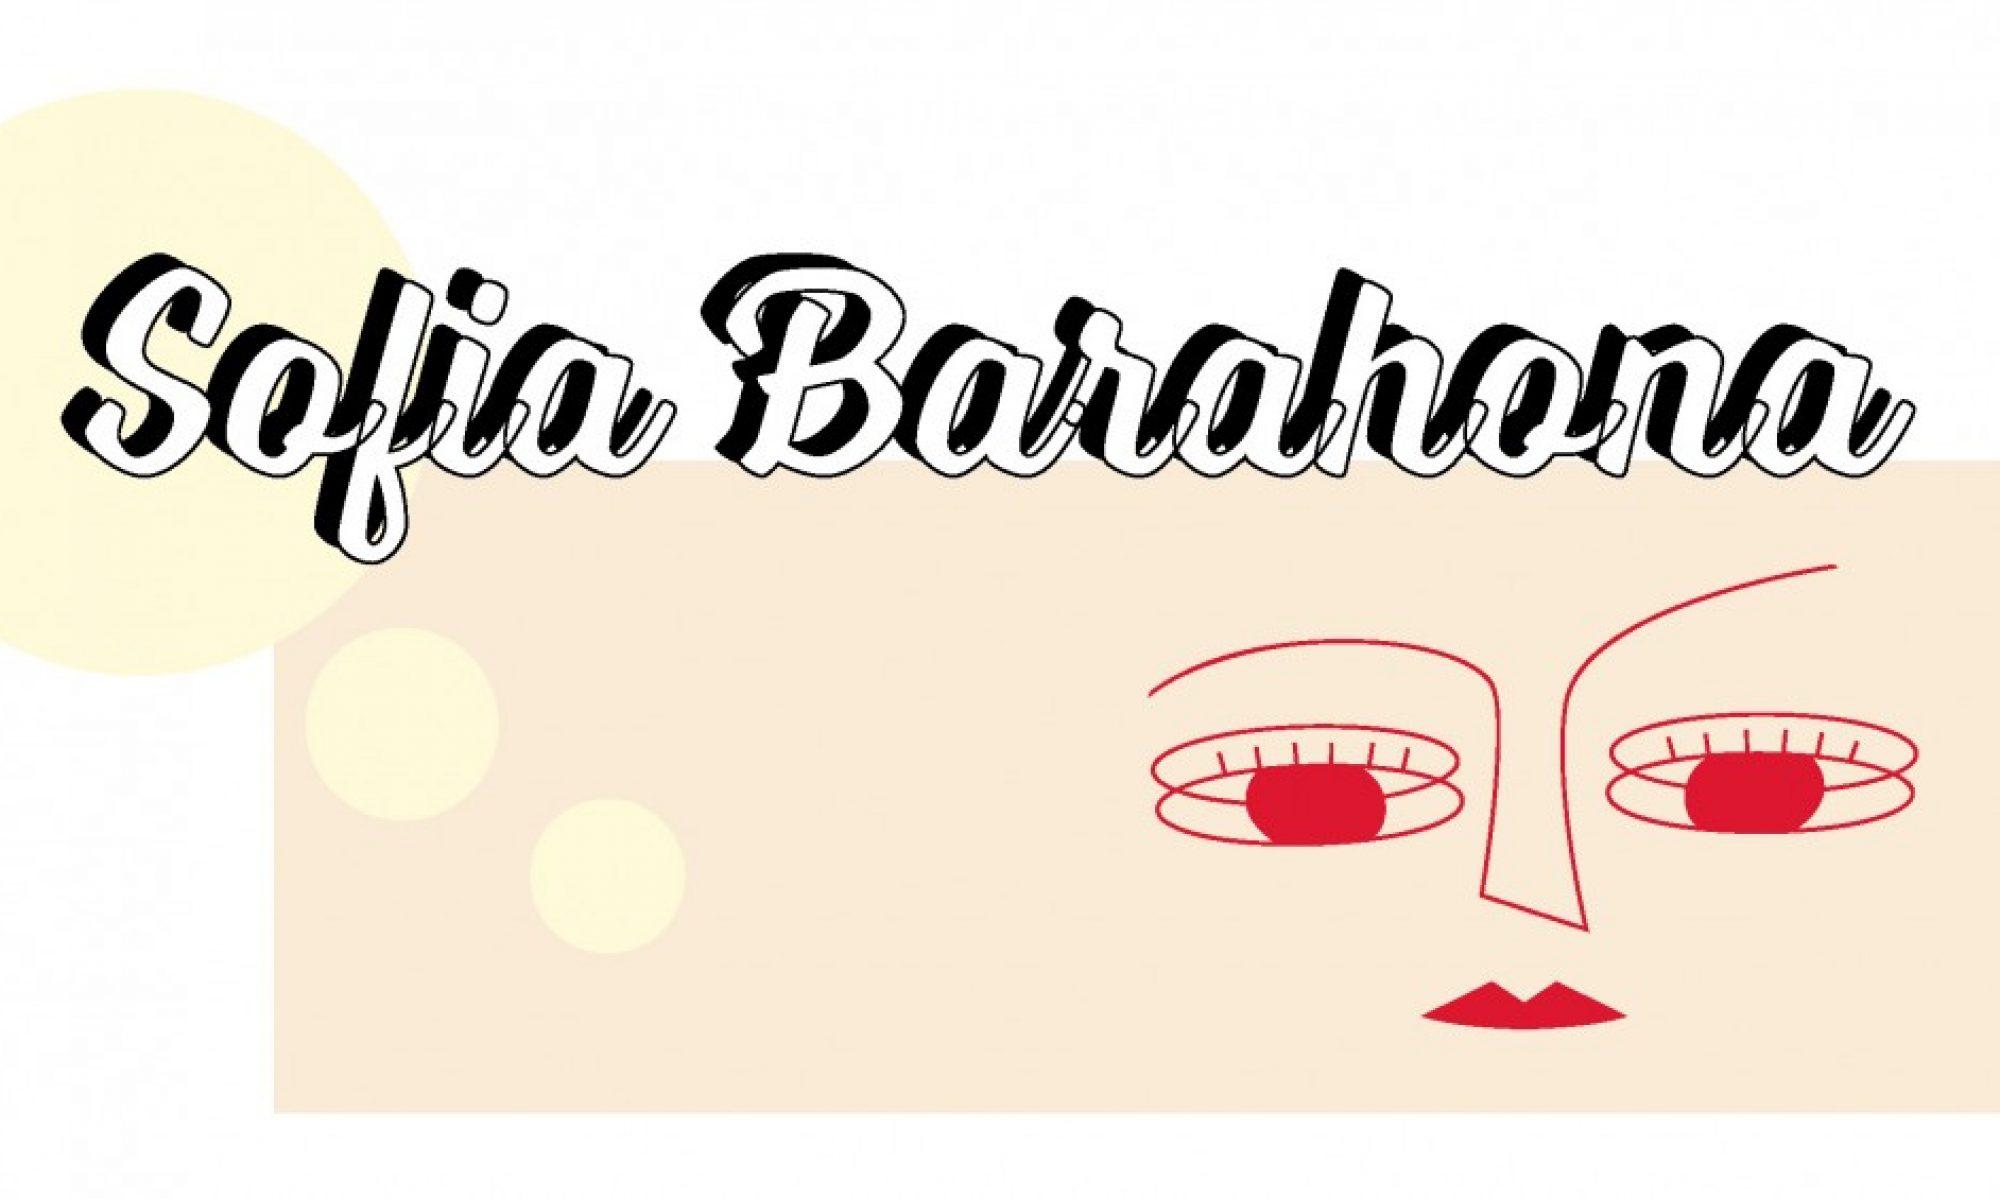 Lourdes Barahona's ePortfolio